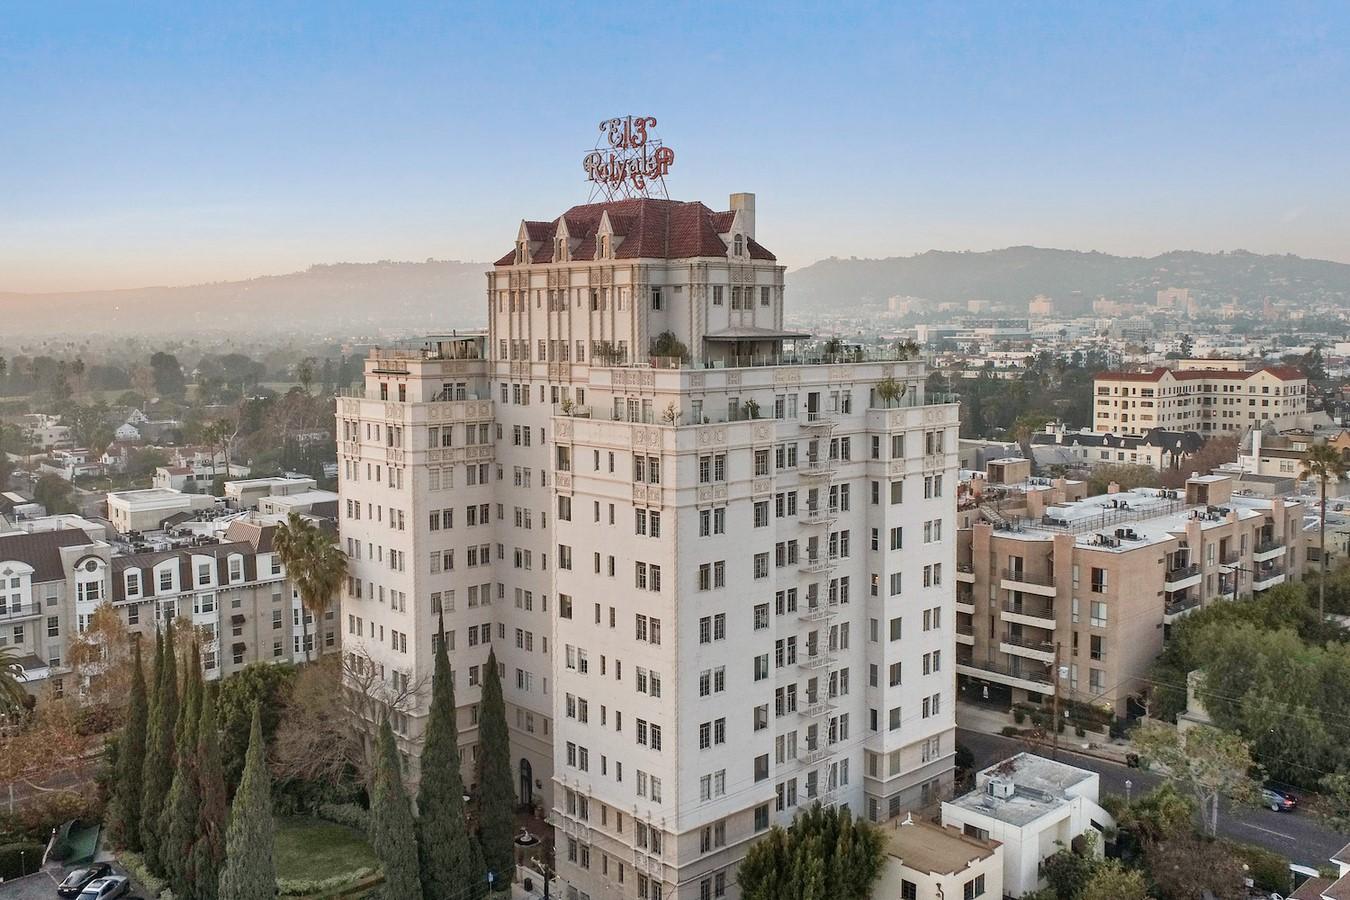 15 beautiful vintage apartments around the world - Sheet20